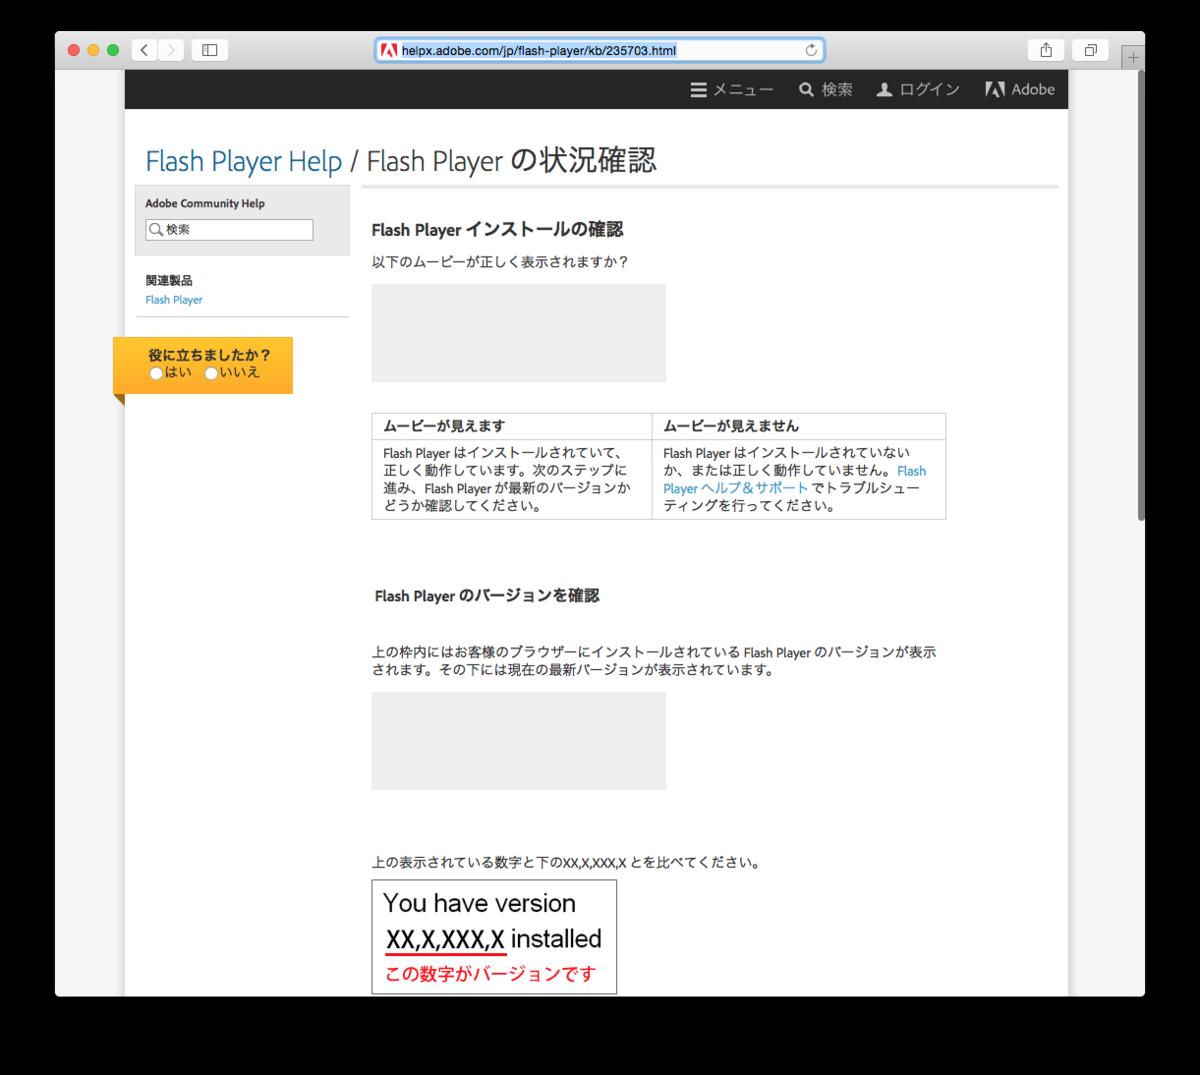 f:id:atsuhiro-me:20151104005348p:plain:w300